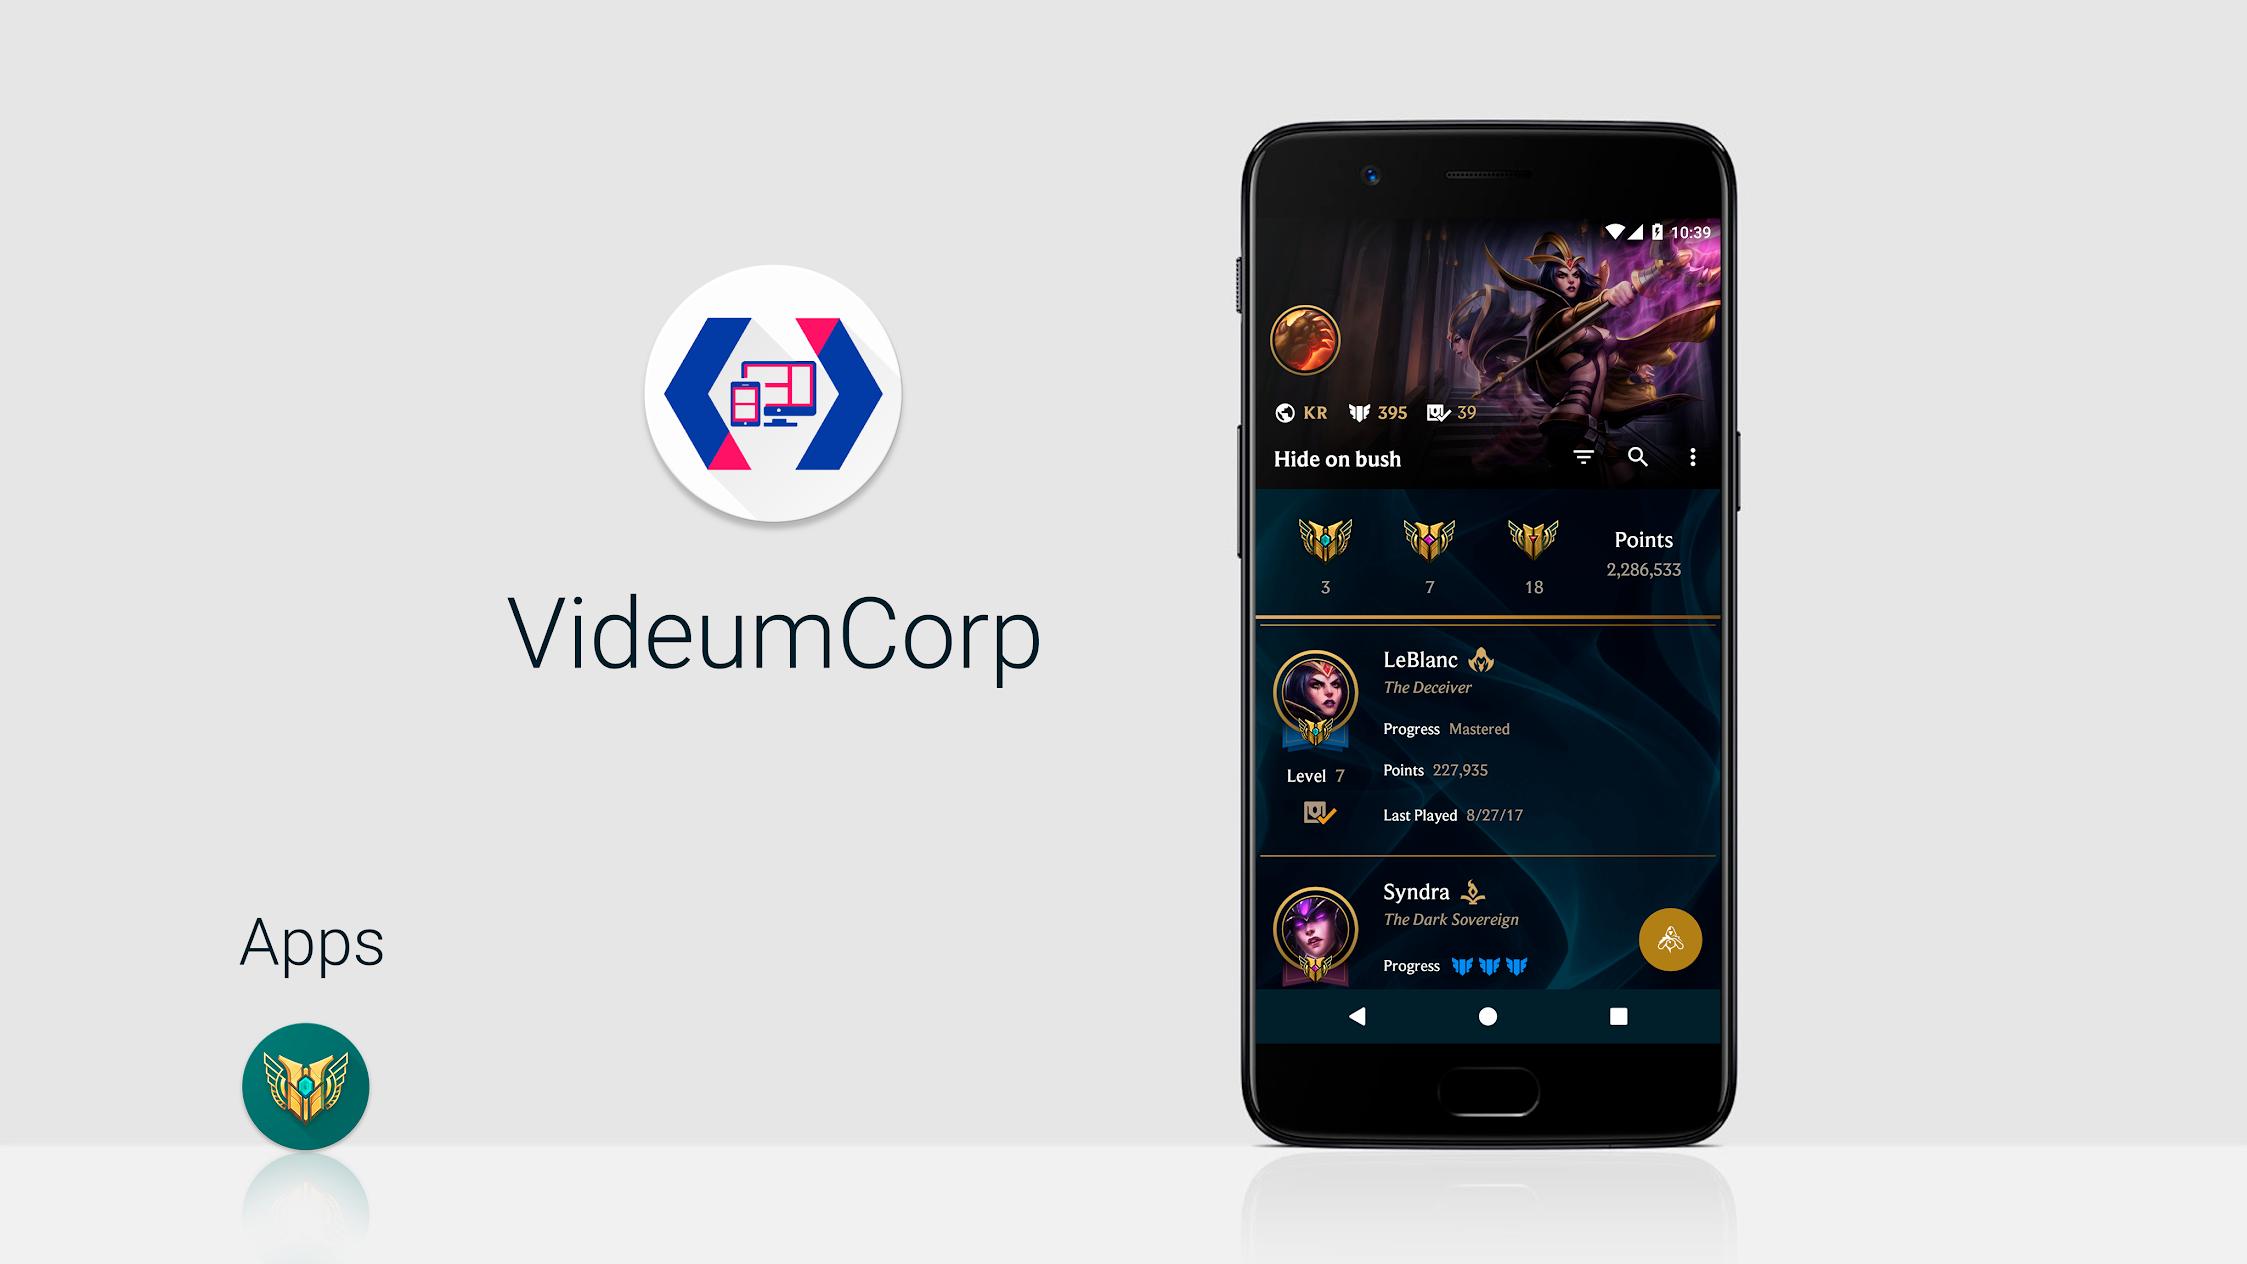 VideumCorp